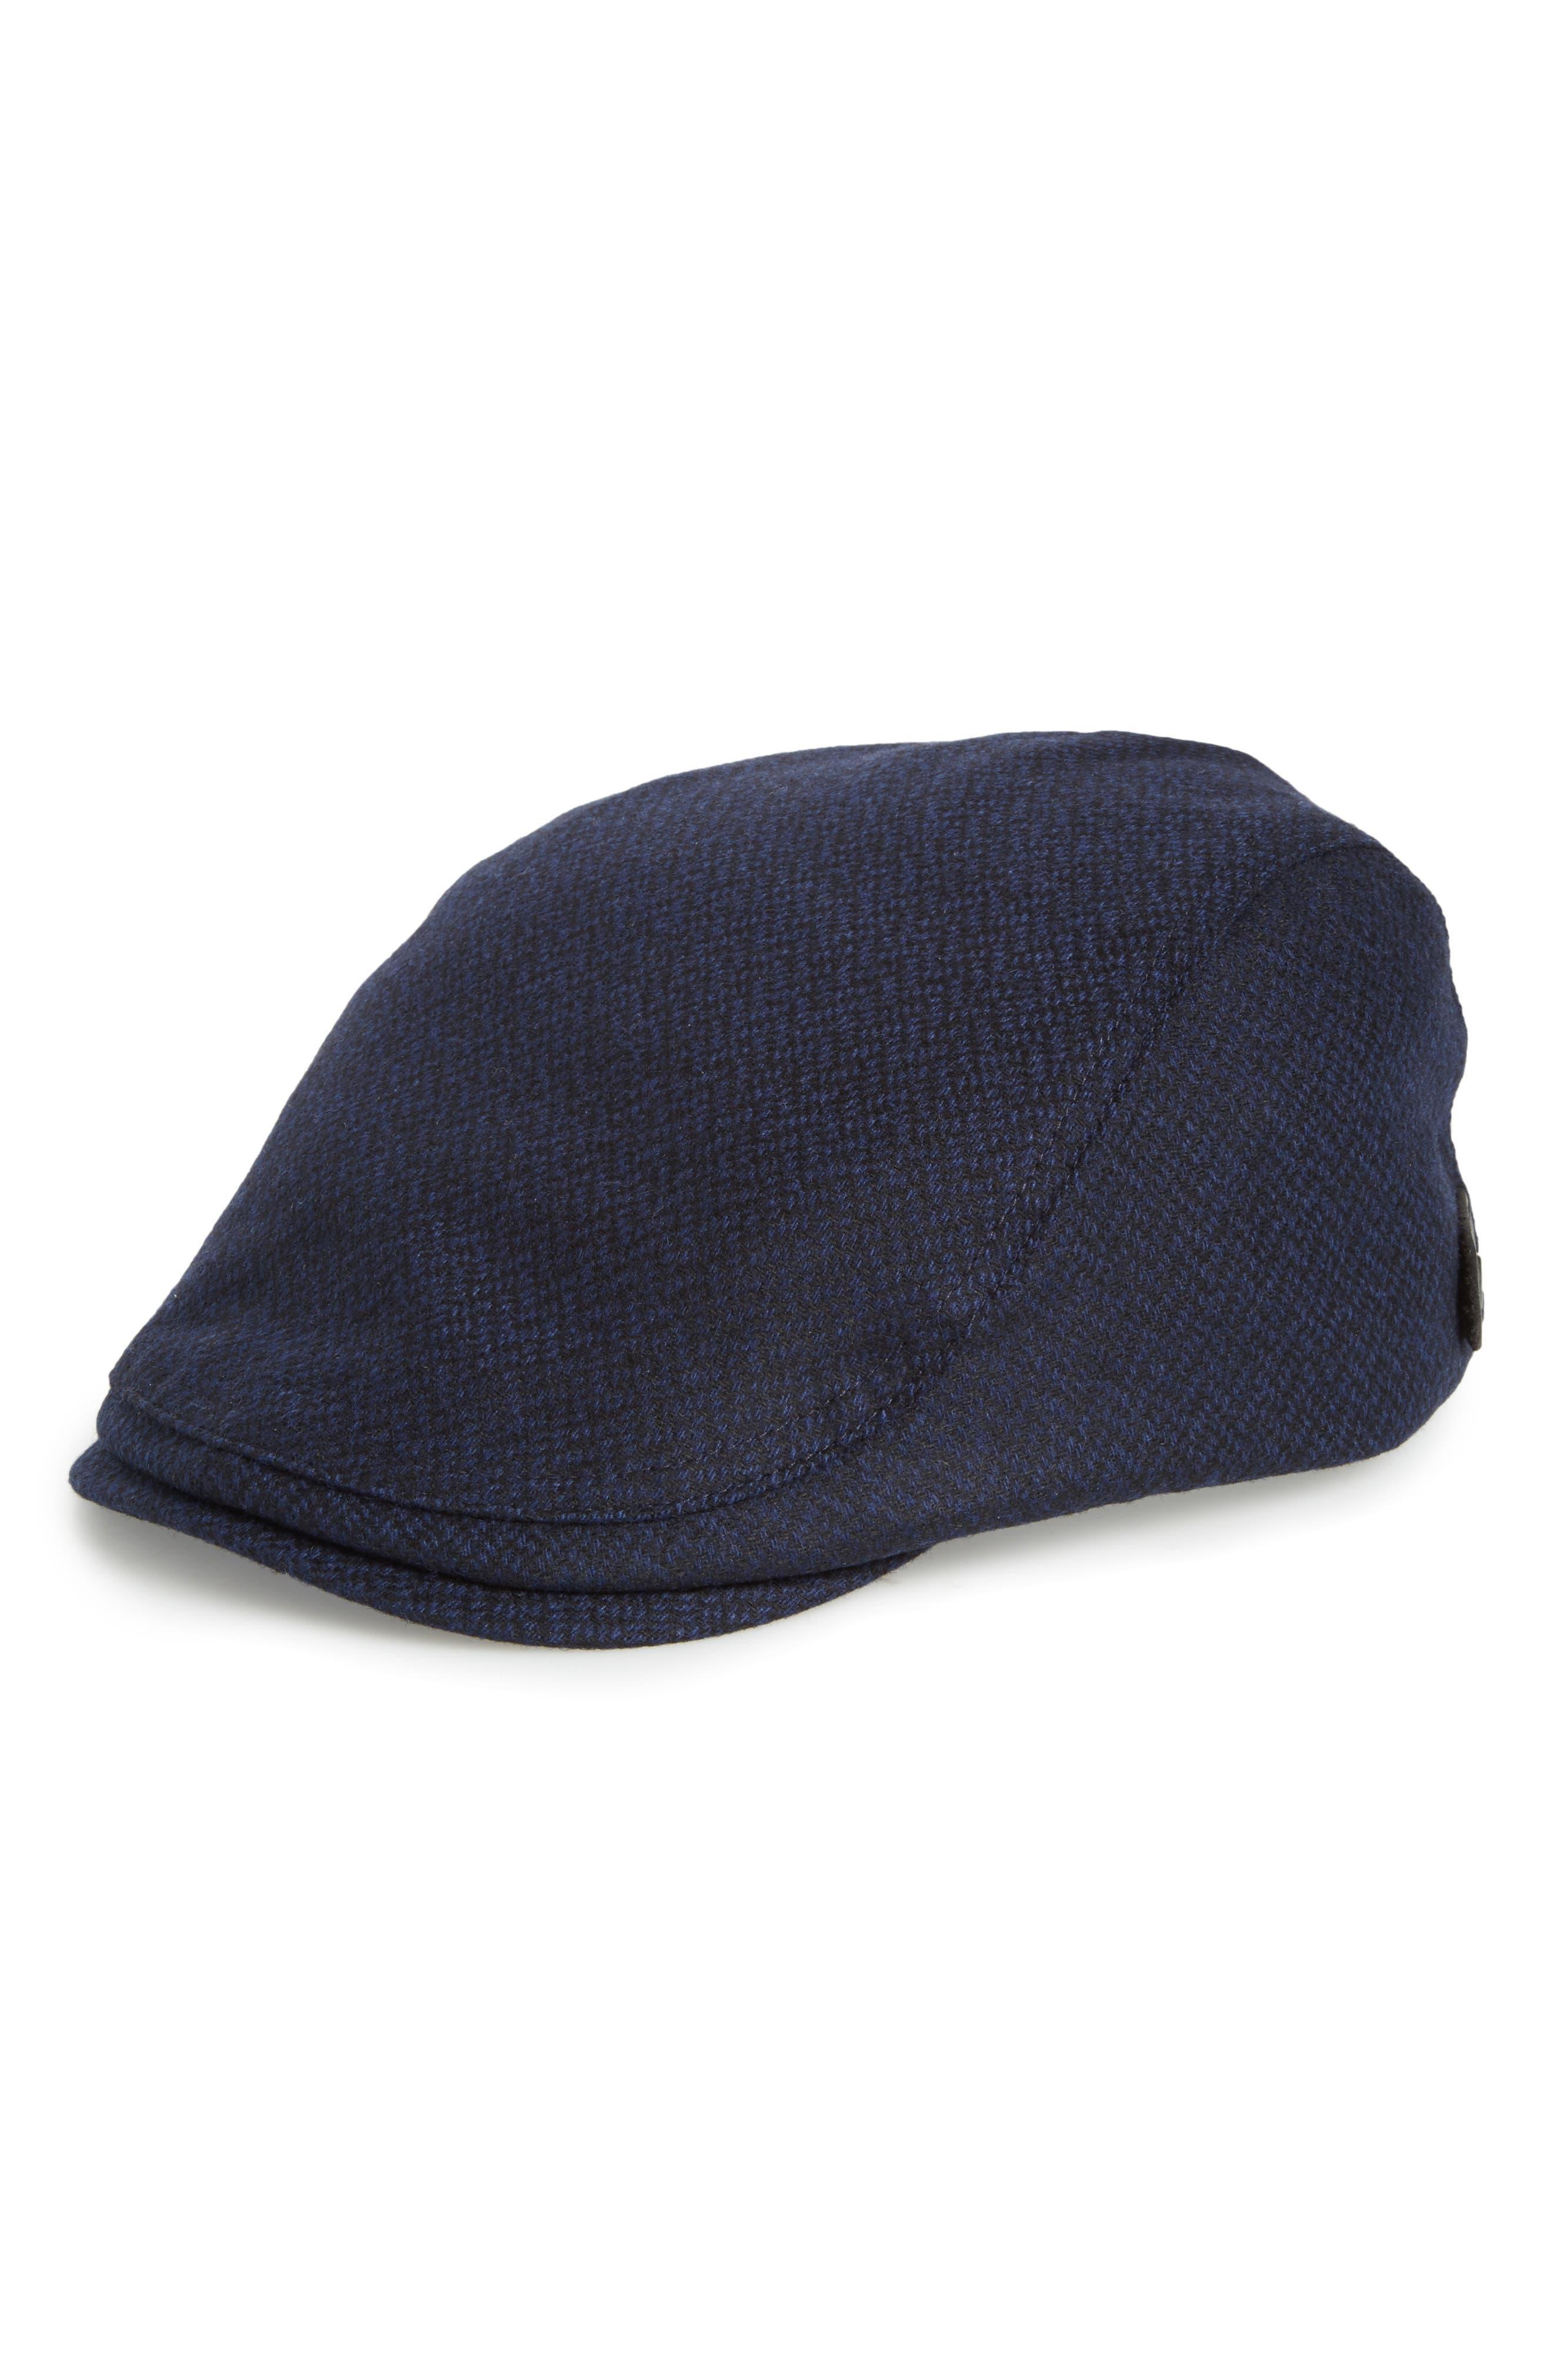 Ted Baker Thompson Wool Blend Flat Driving Cap,                             Main thumbnail 2, color,